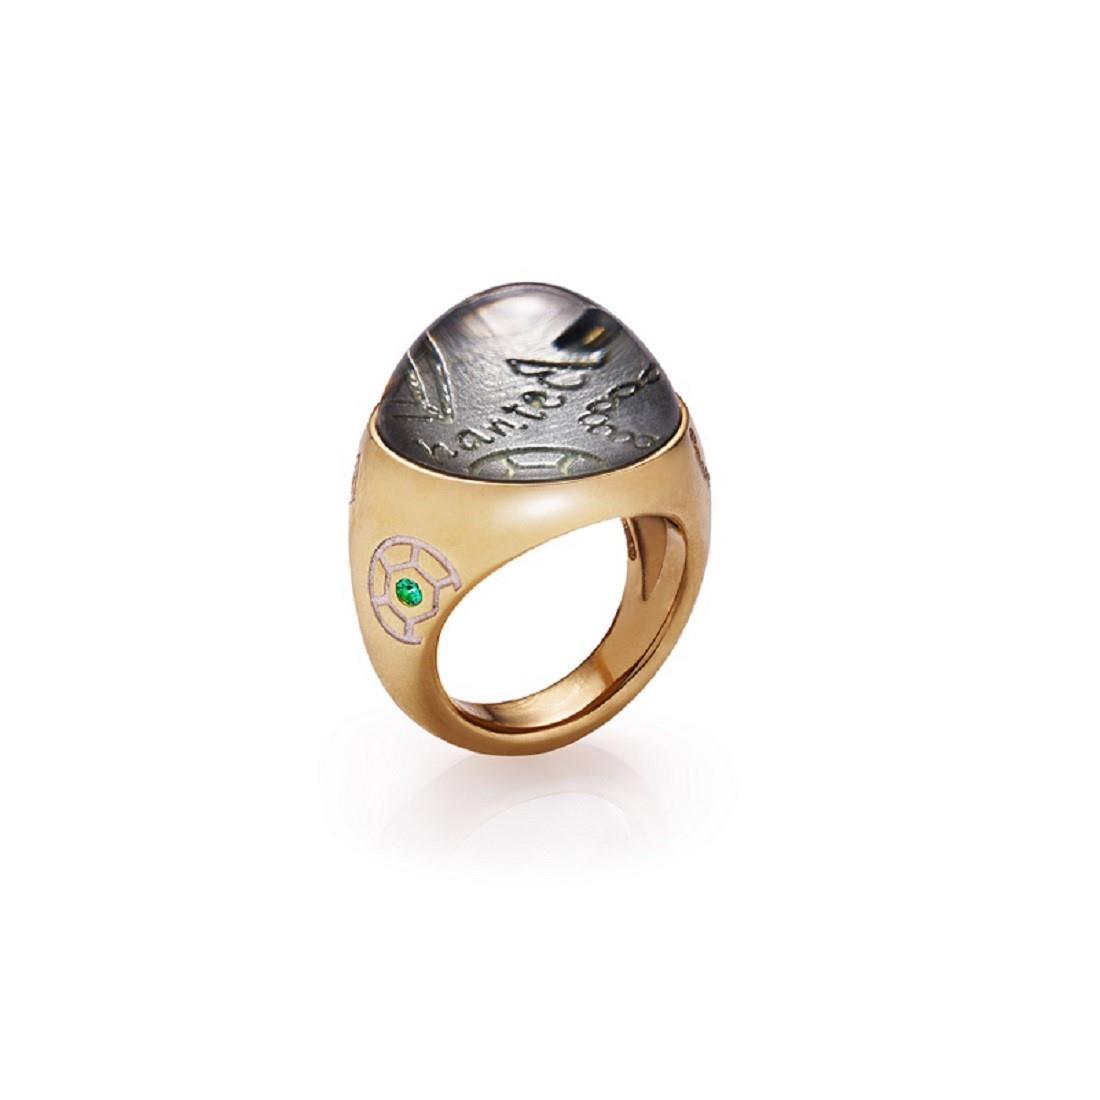 Anillo con diamantes y piedras preciosas - CHANTECLER